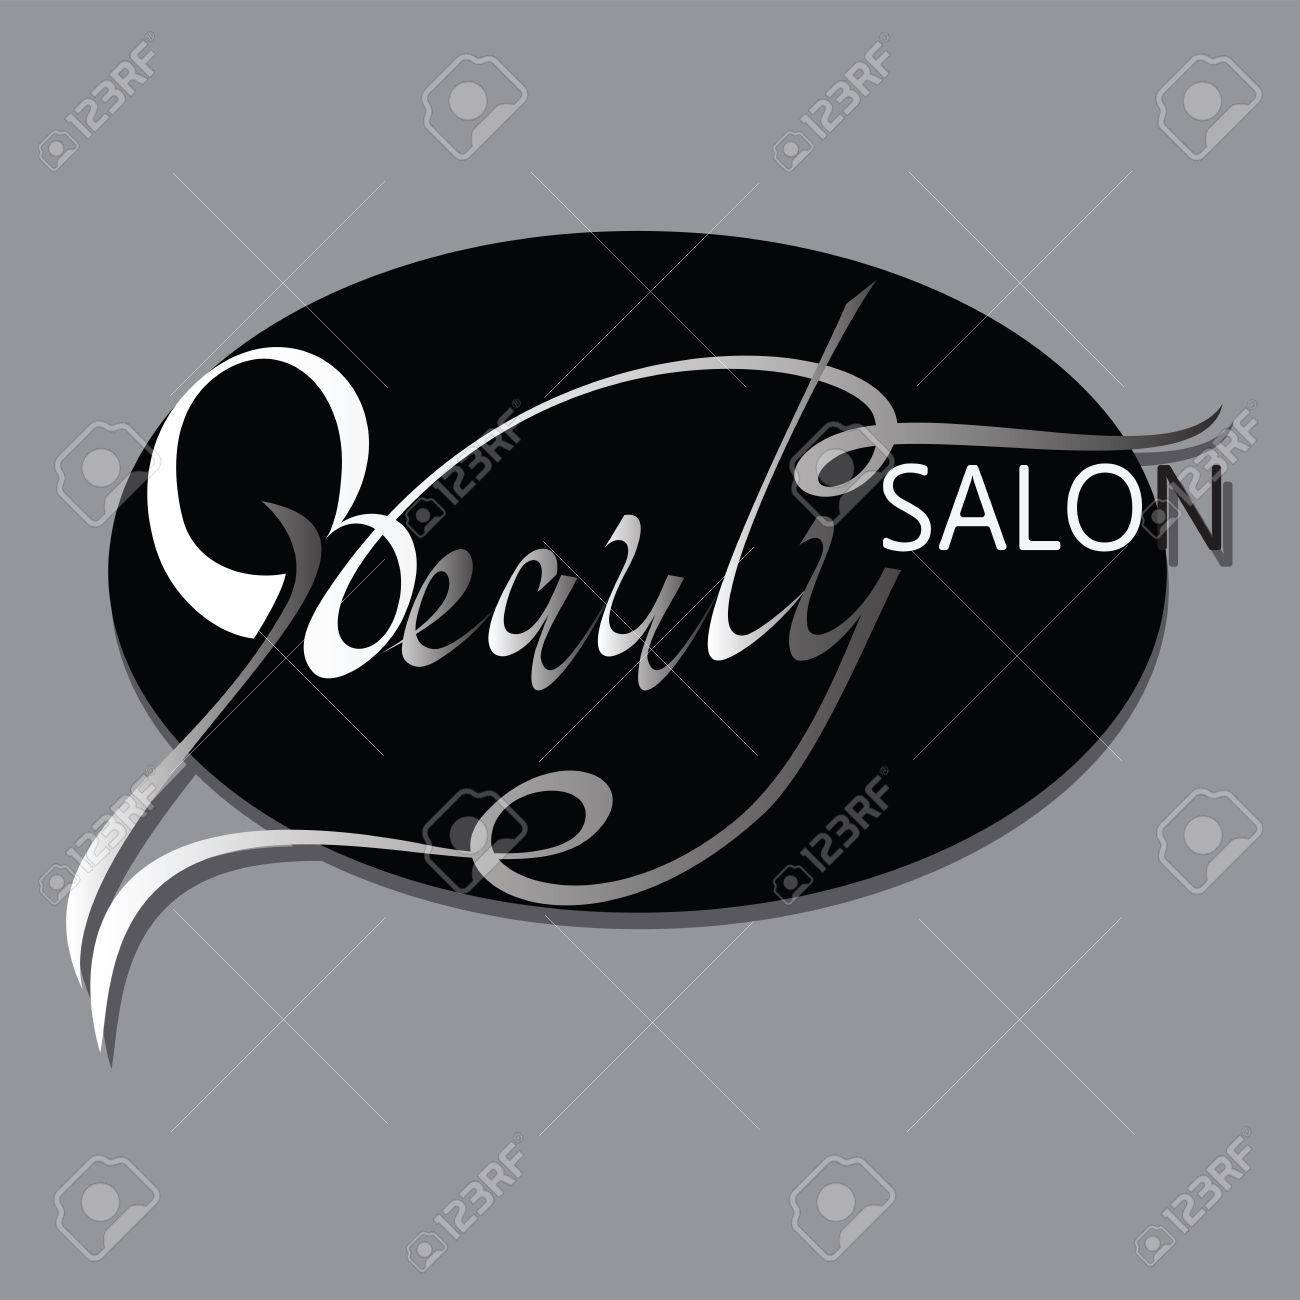 BEAUTY SALON Logo Design Hand Drawn Text Phrase Decorative In Oval